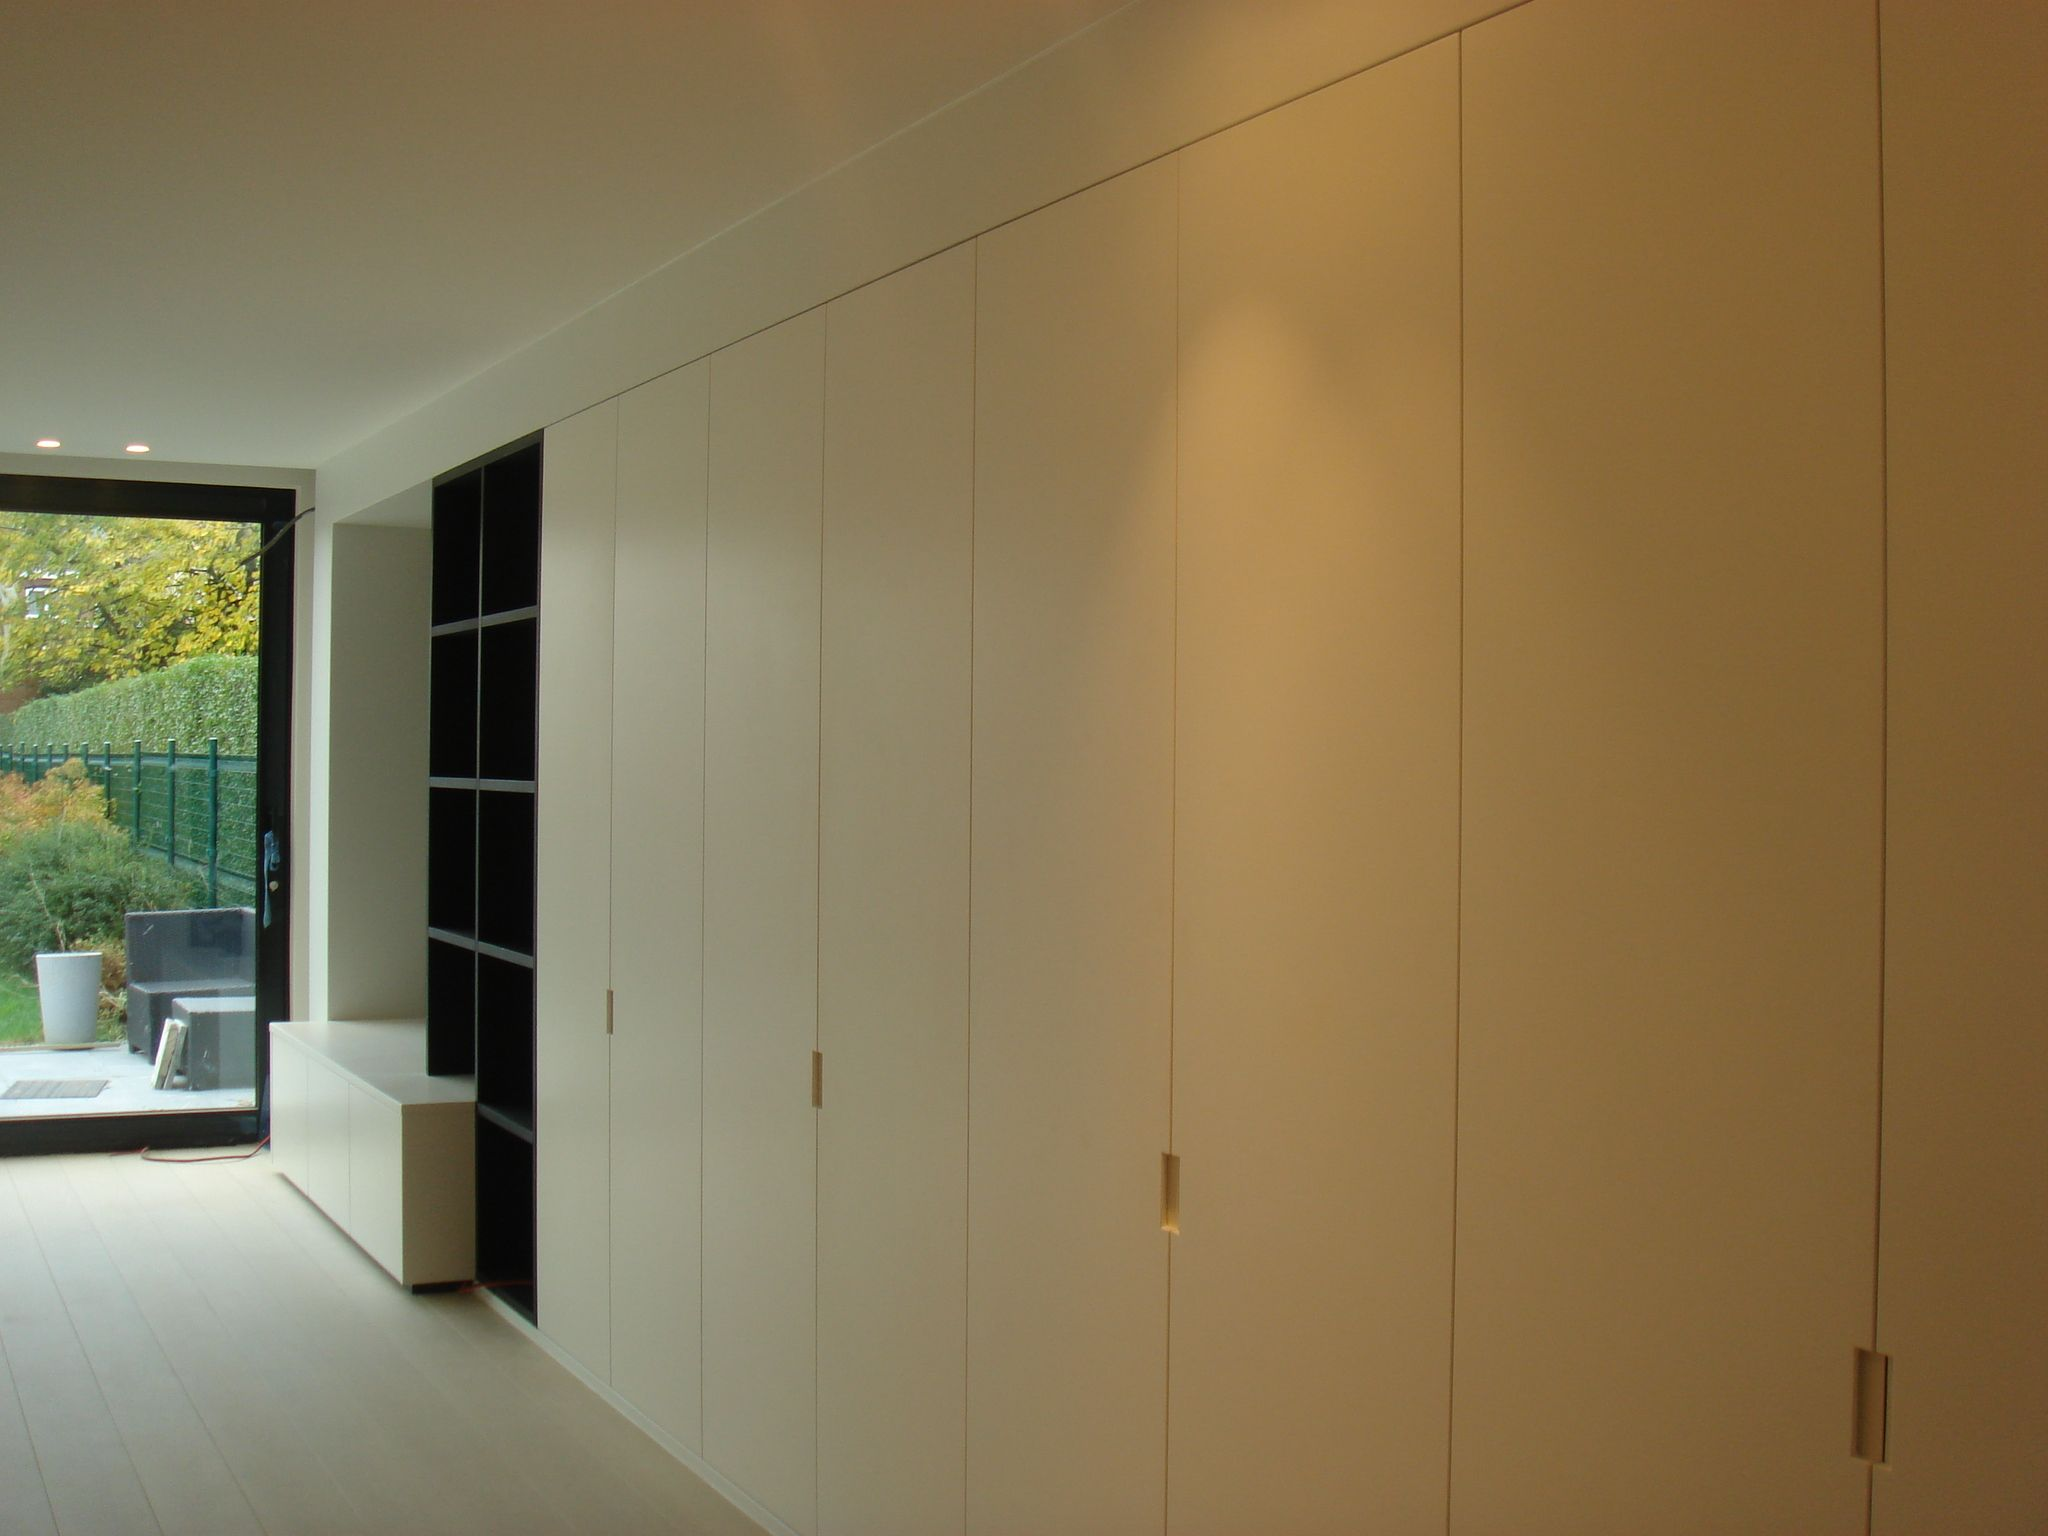 Inrichting leefruimte tv wand eik fineer donker gekleurd for Donker interieur